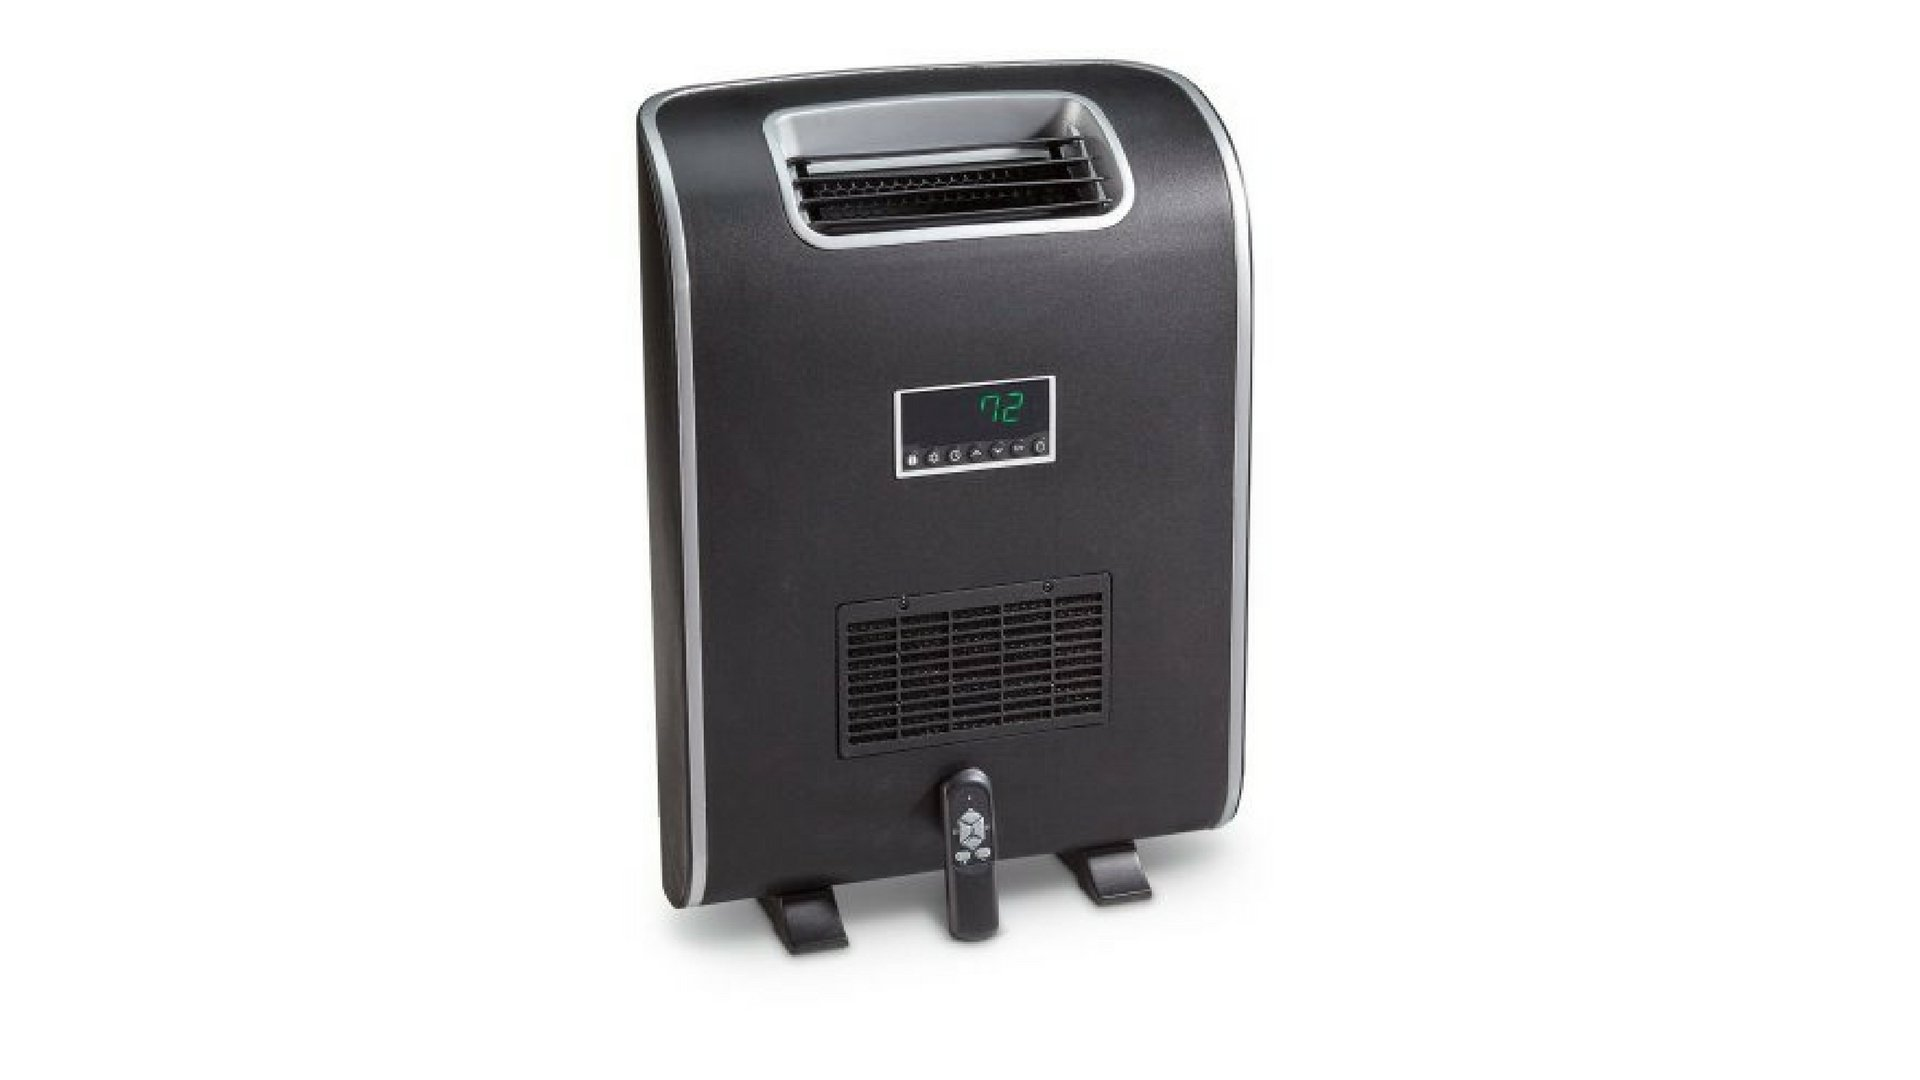 24'' 4 Element Infrared Quartz Heater with Smart Boost Instant Heat